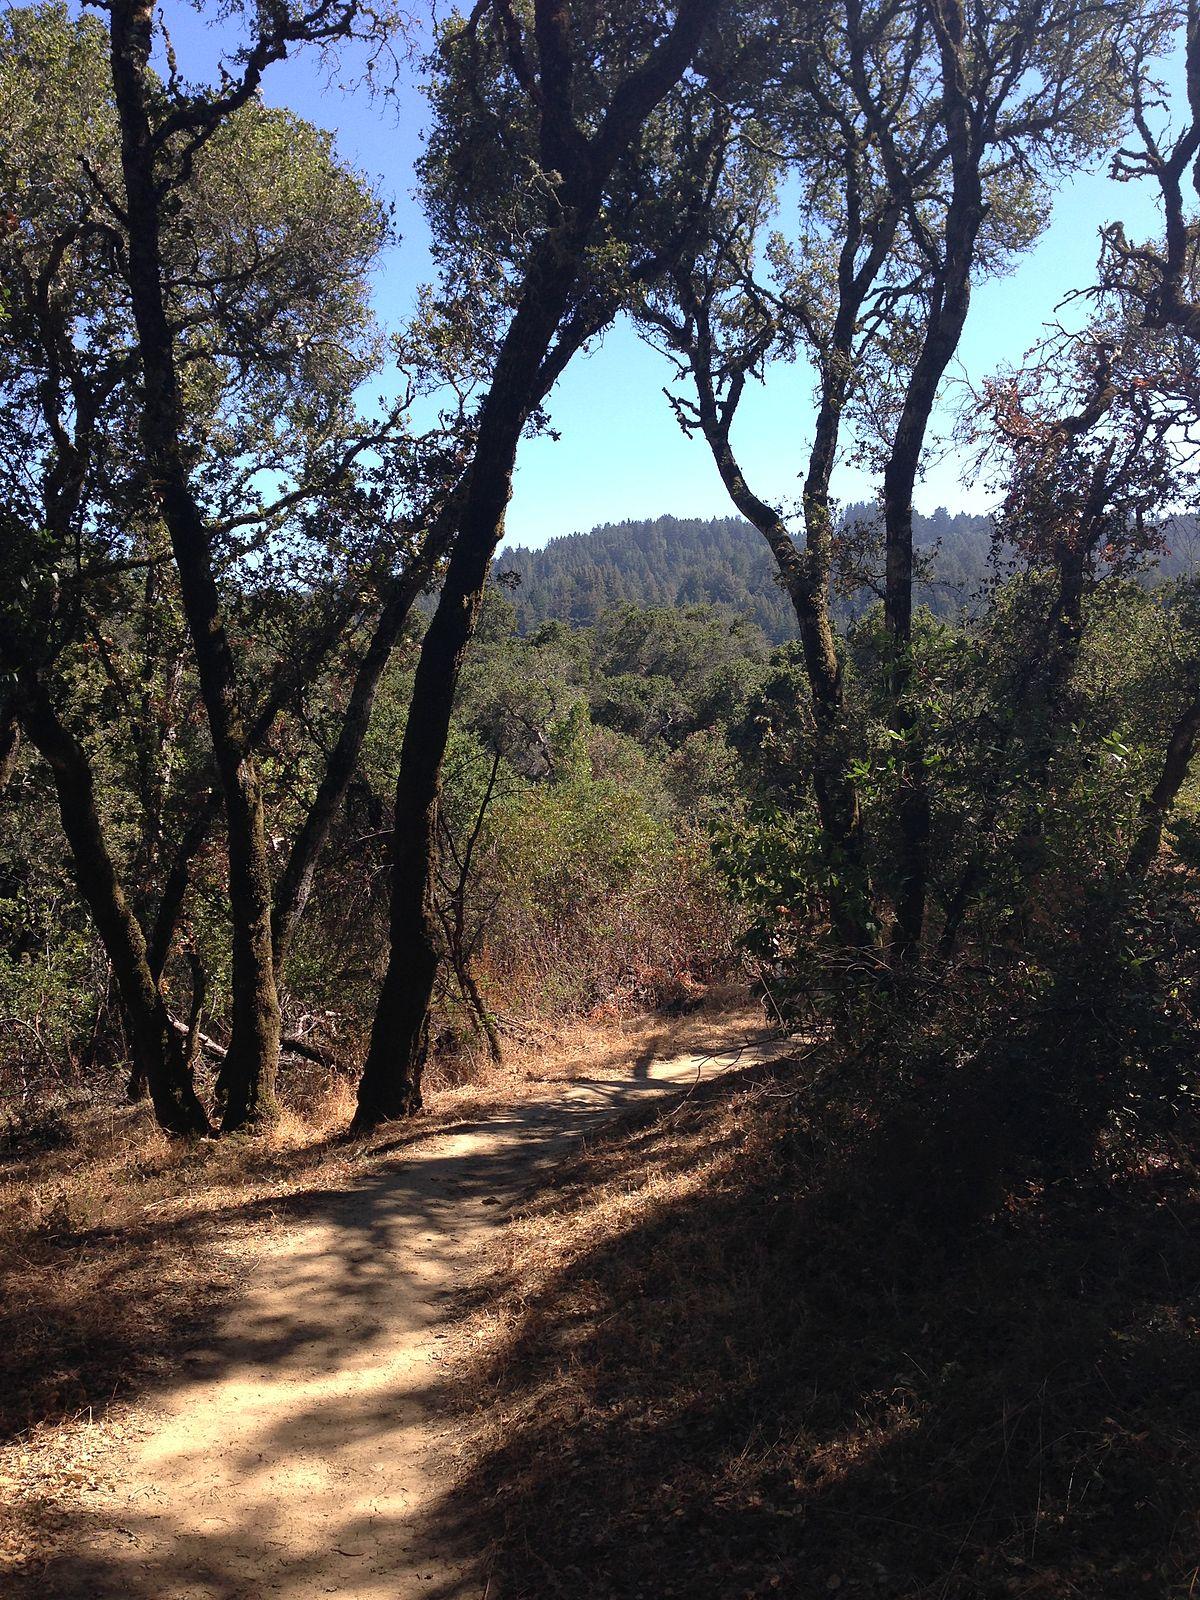 University San Francisco >> Thornewood Open Space Preserve - Wikipedia